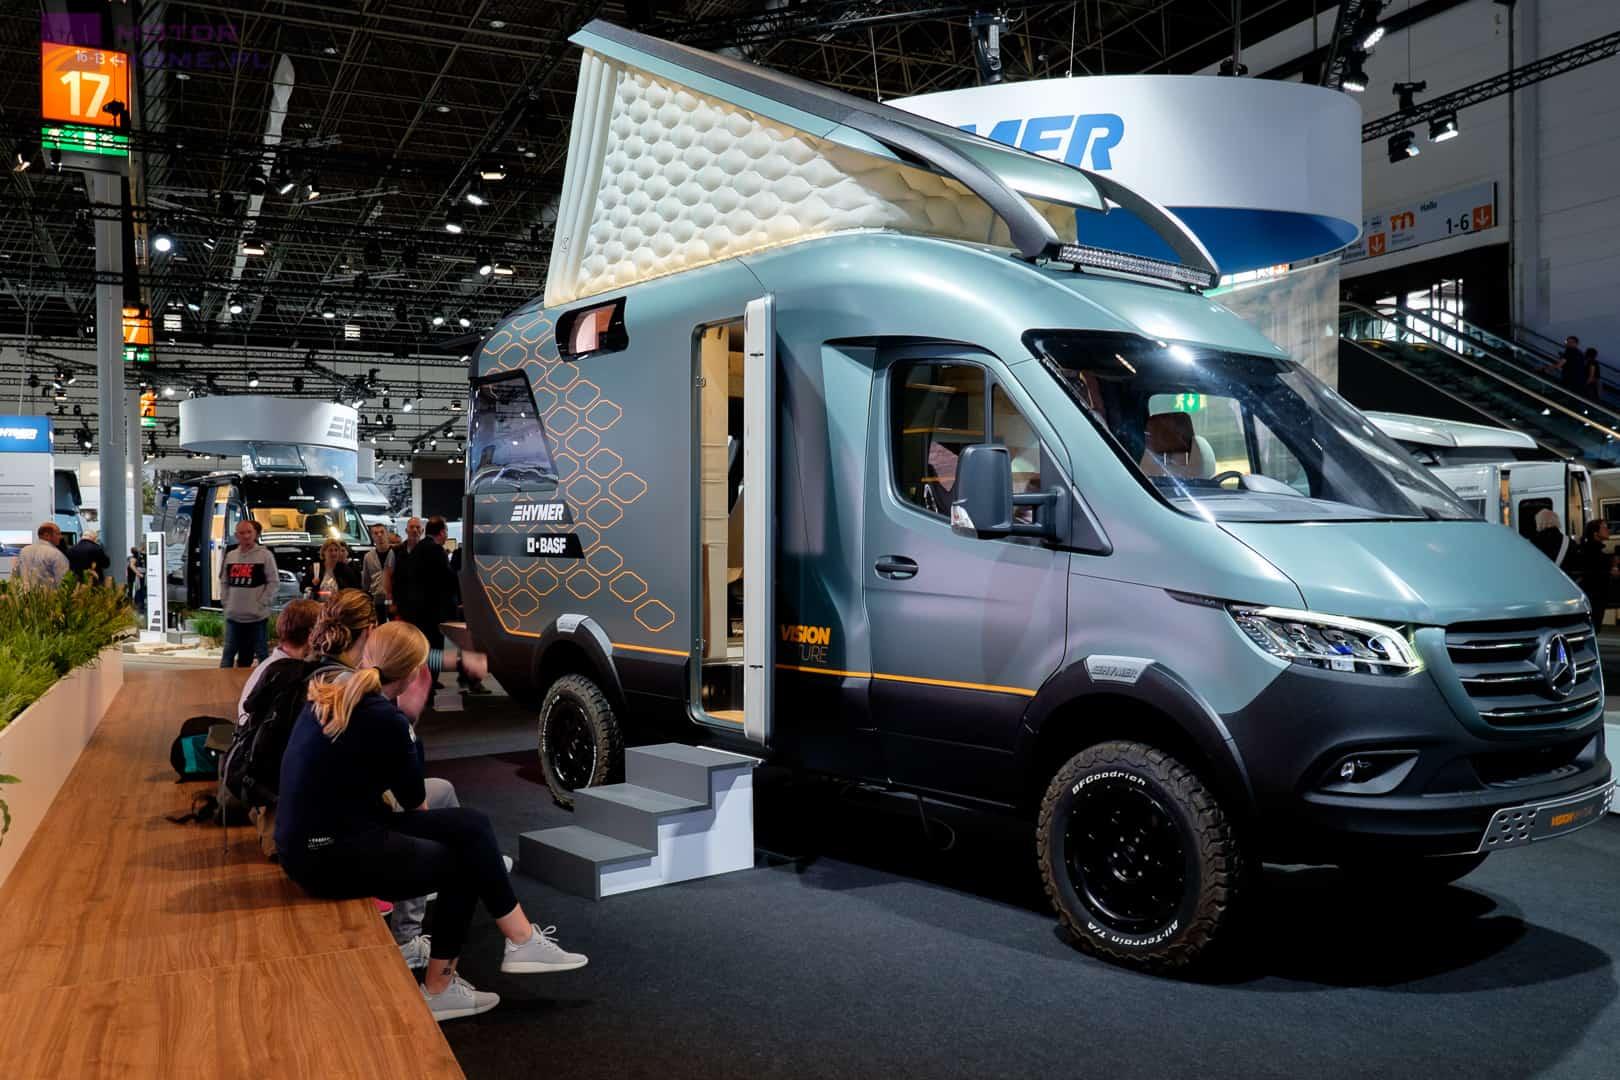 HYMER BASF at Caravan Salon 2019